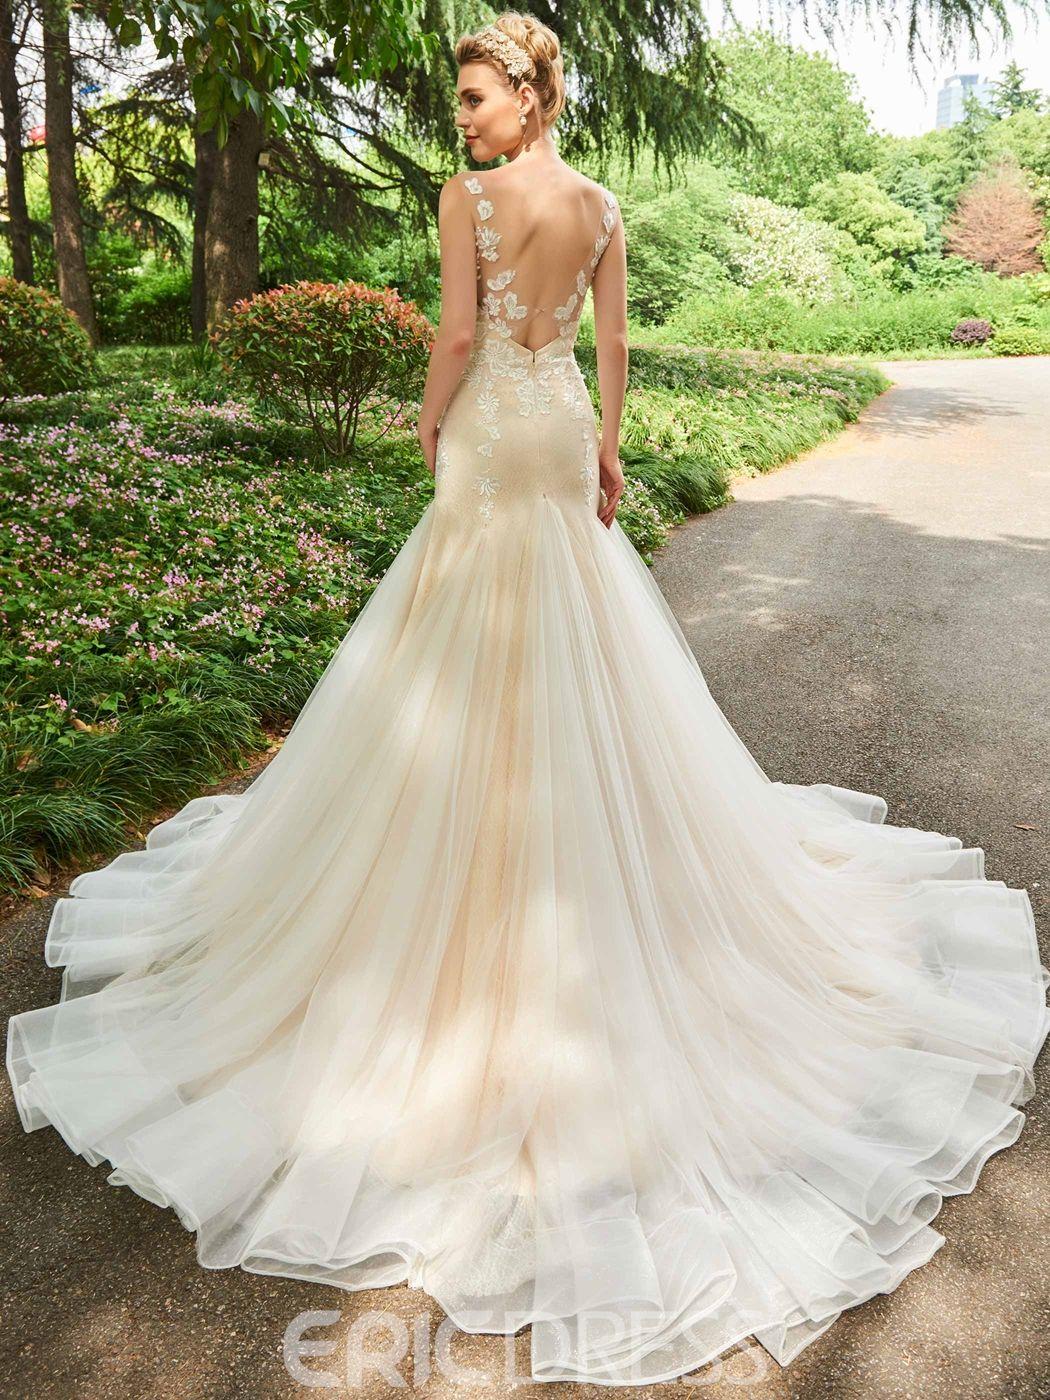 Ericdress V Neck Backless Mermaid Appliques Color Wedding Dress Lace Mermaid Wedding Dress Wedding Dresses Wedding Dresses Lace [ 1400 x 1050 Pixel ]